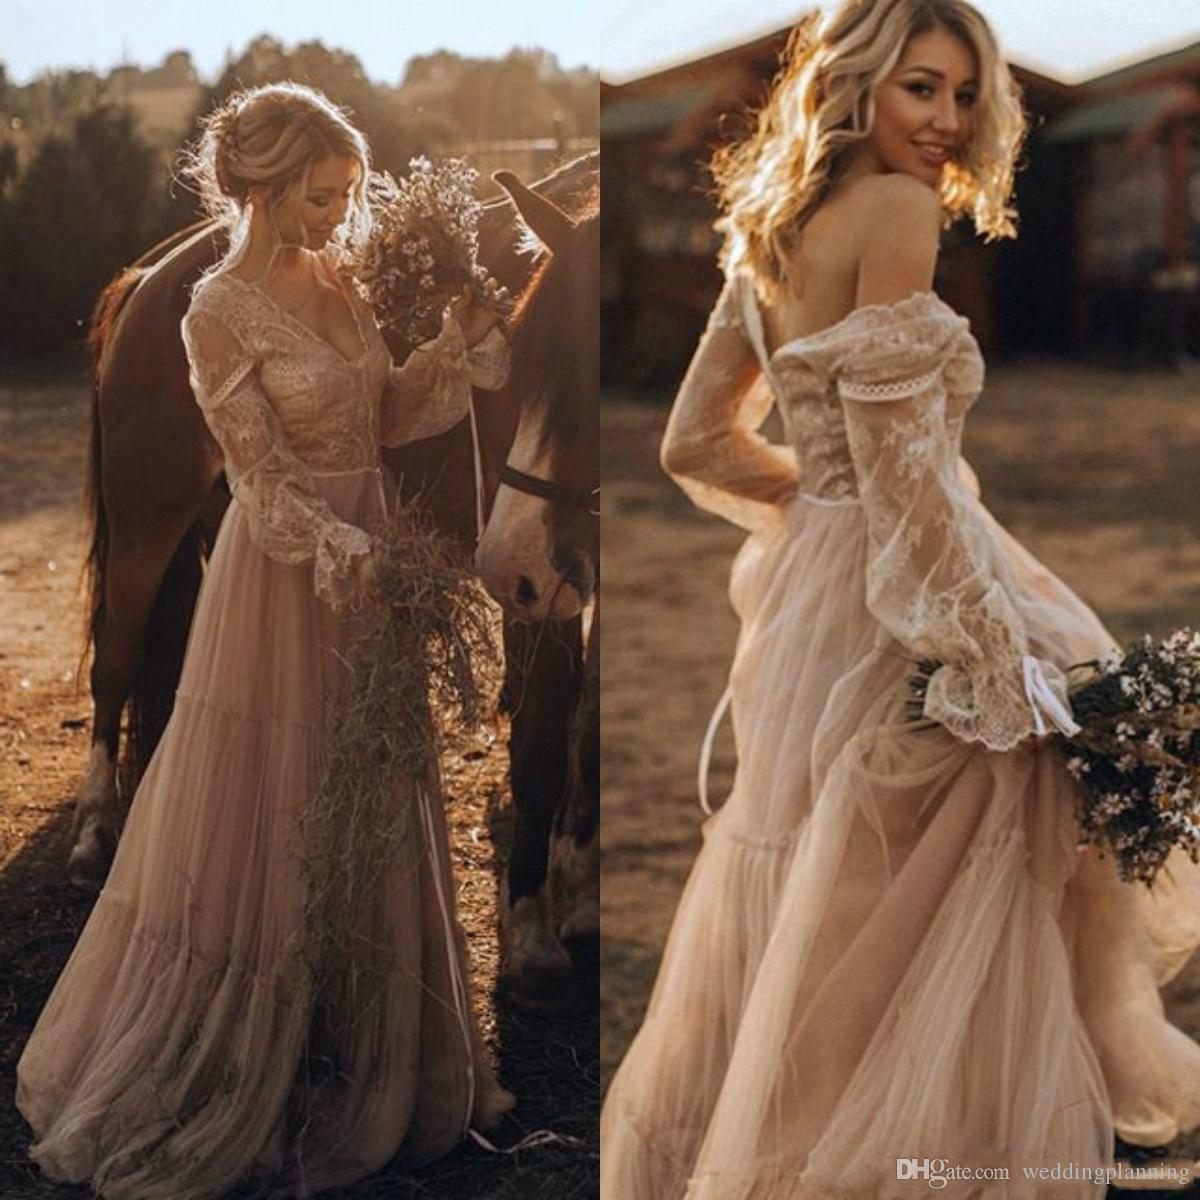 Encaje con encaje Primavera V-Cuello con cuello en V Vestidos de novia Boho Bohemio Manga larga Pequeño Árabe Talla grande Vestido de Noiva Bola de bola de novia Novia